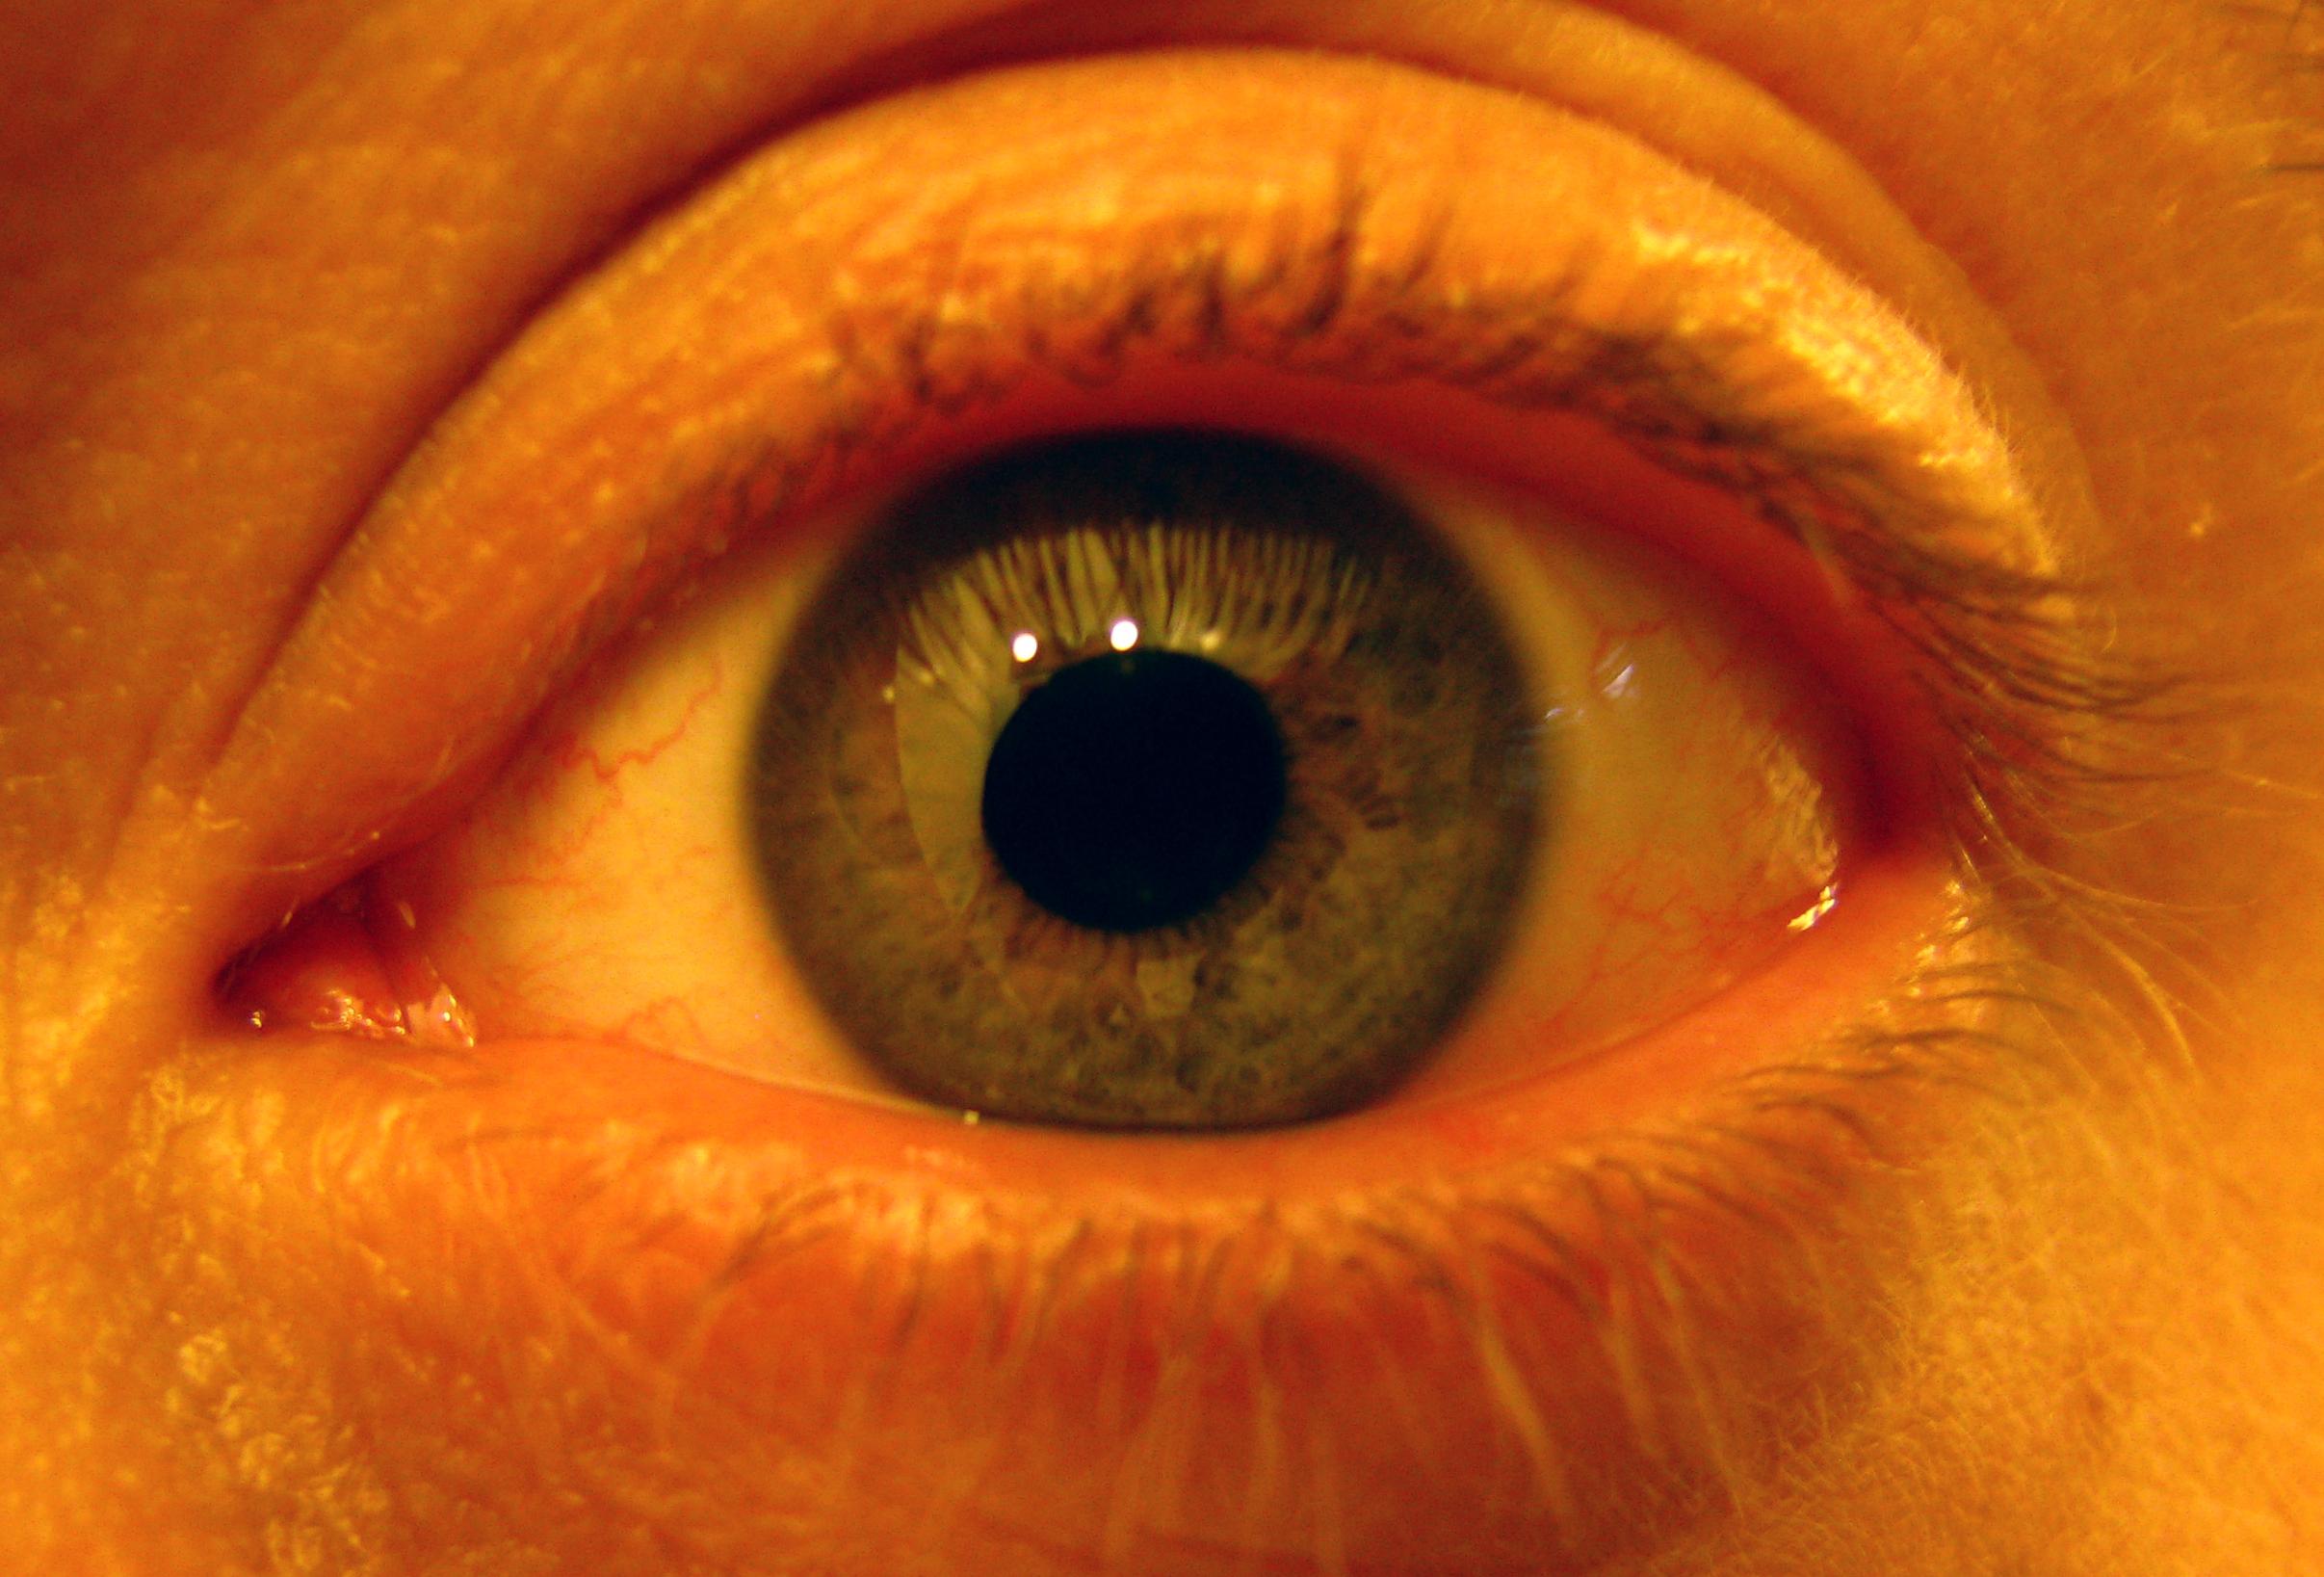 Look into my (dilated) eye